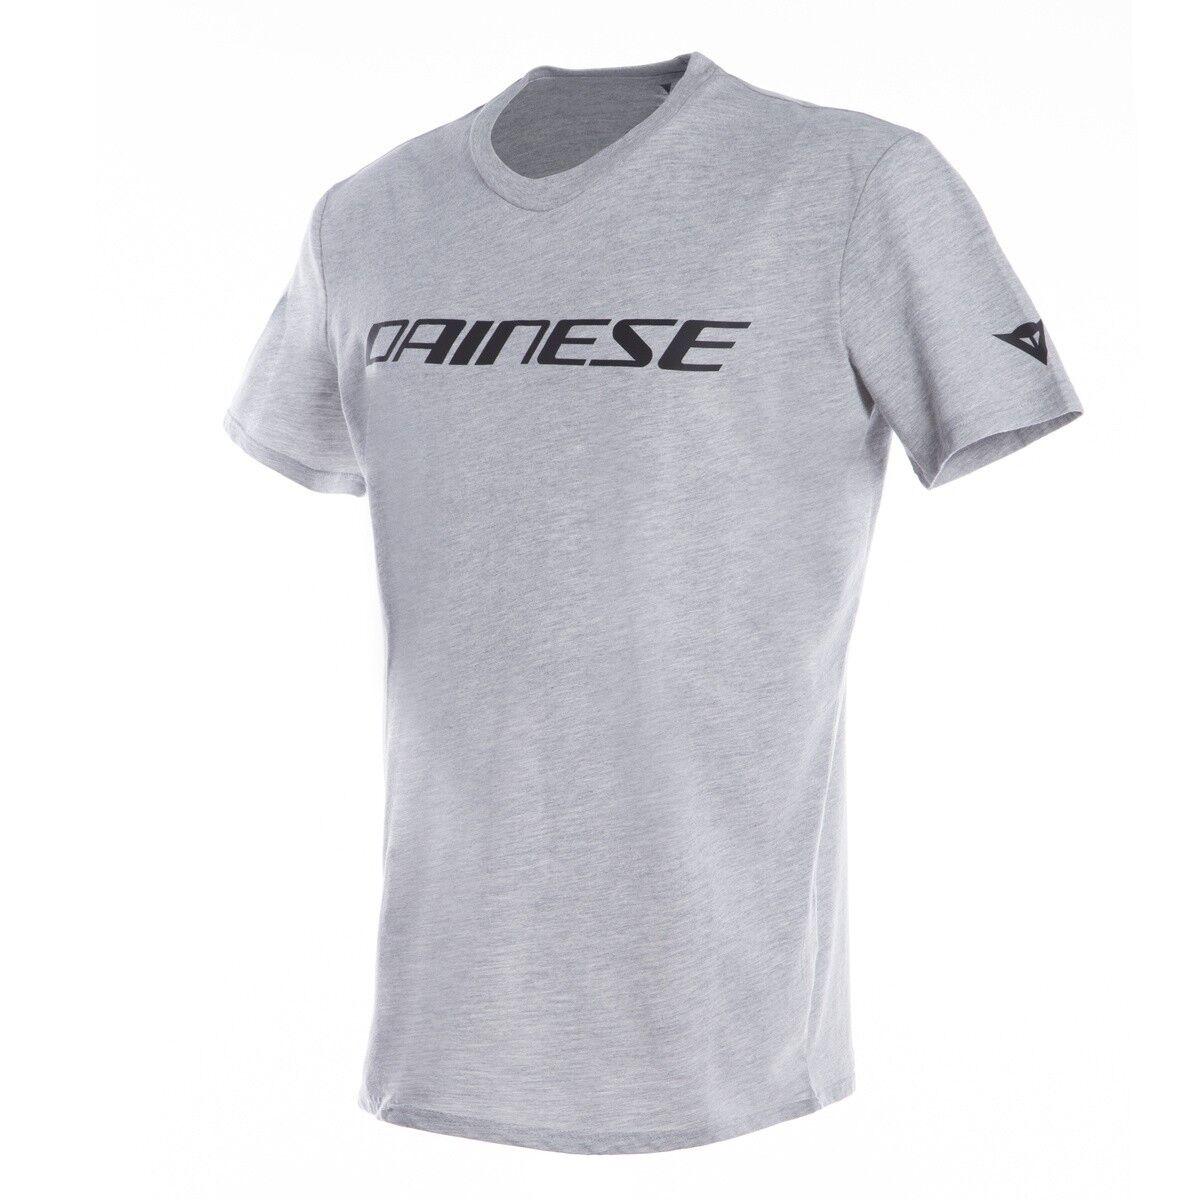 Leisure Motorcycle T-Shirt Dainese Logo in Grey Merchandising New